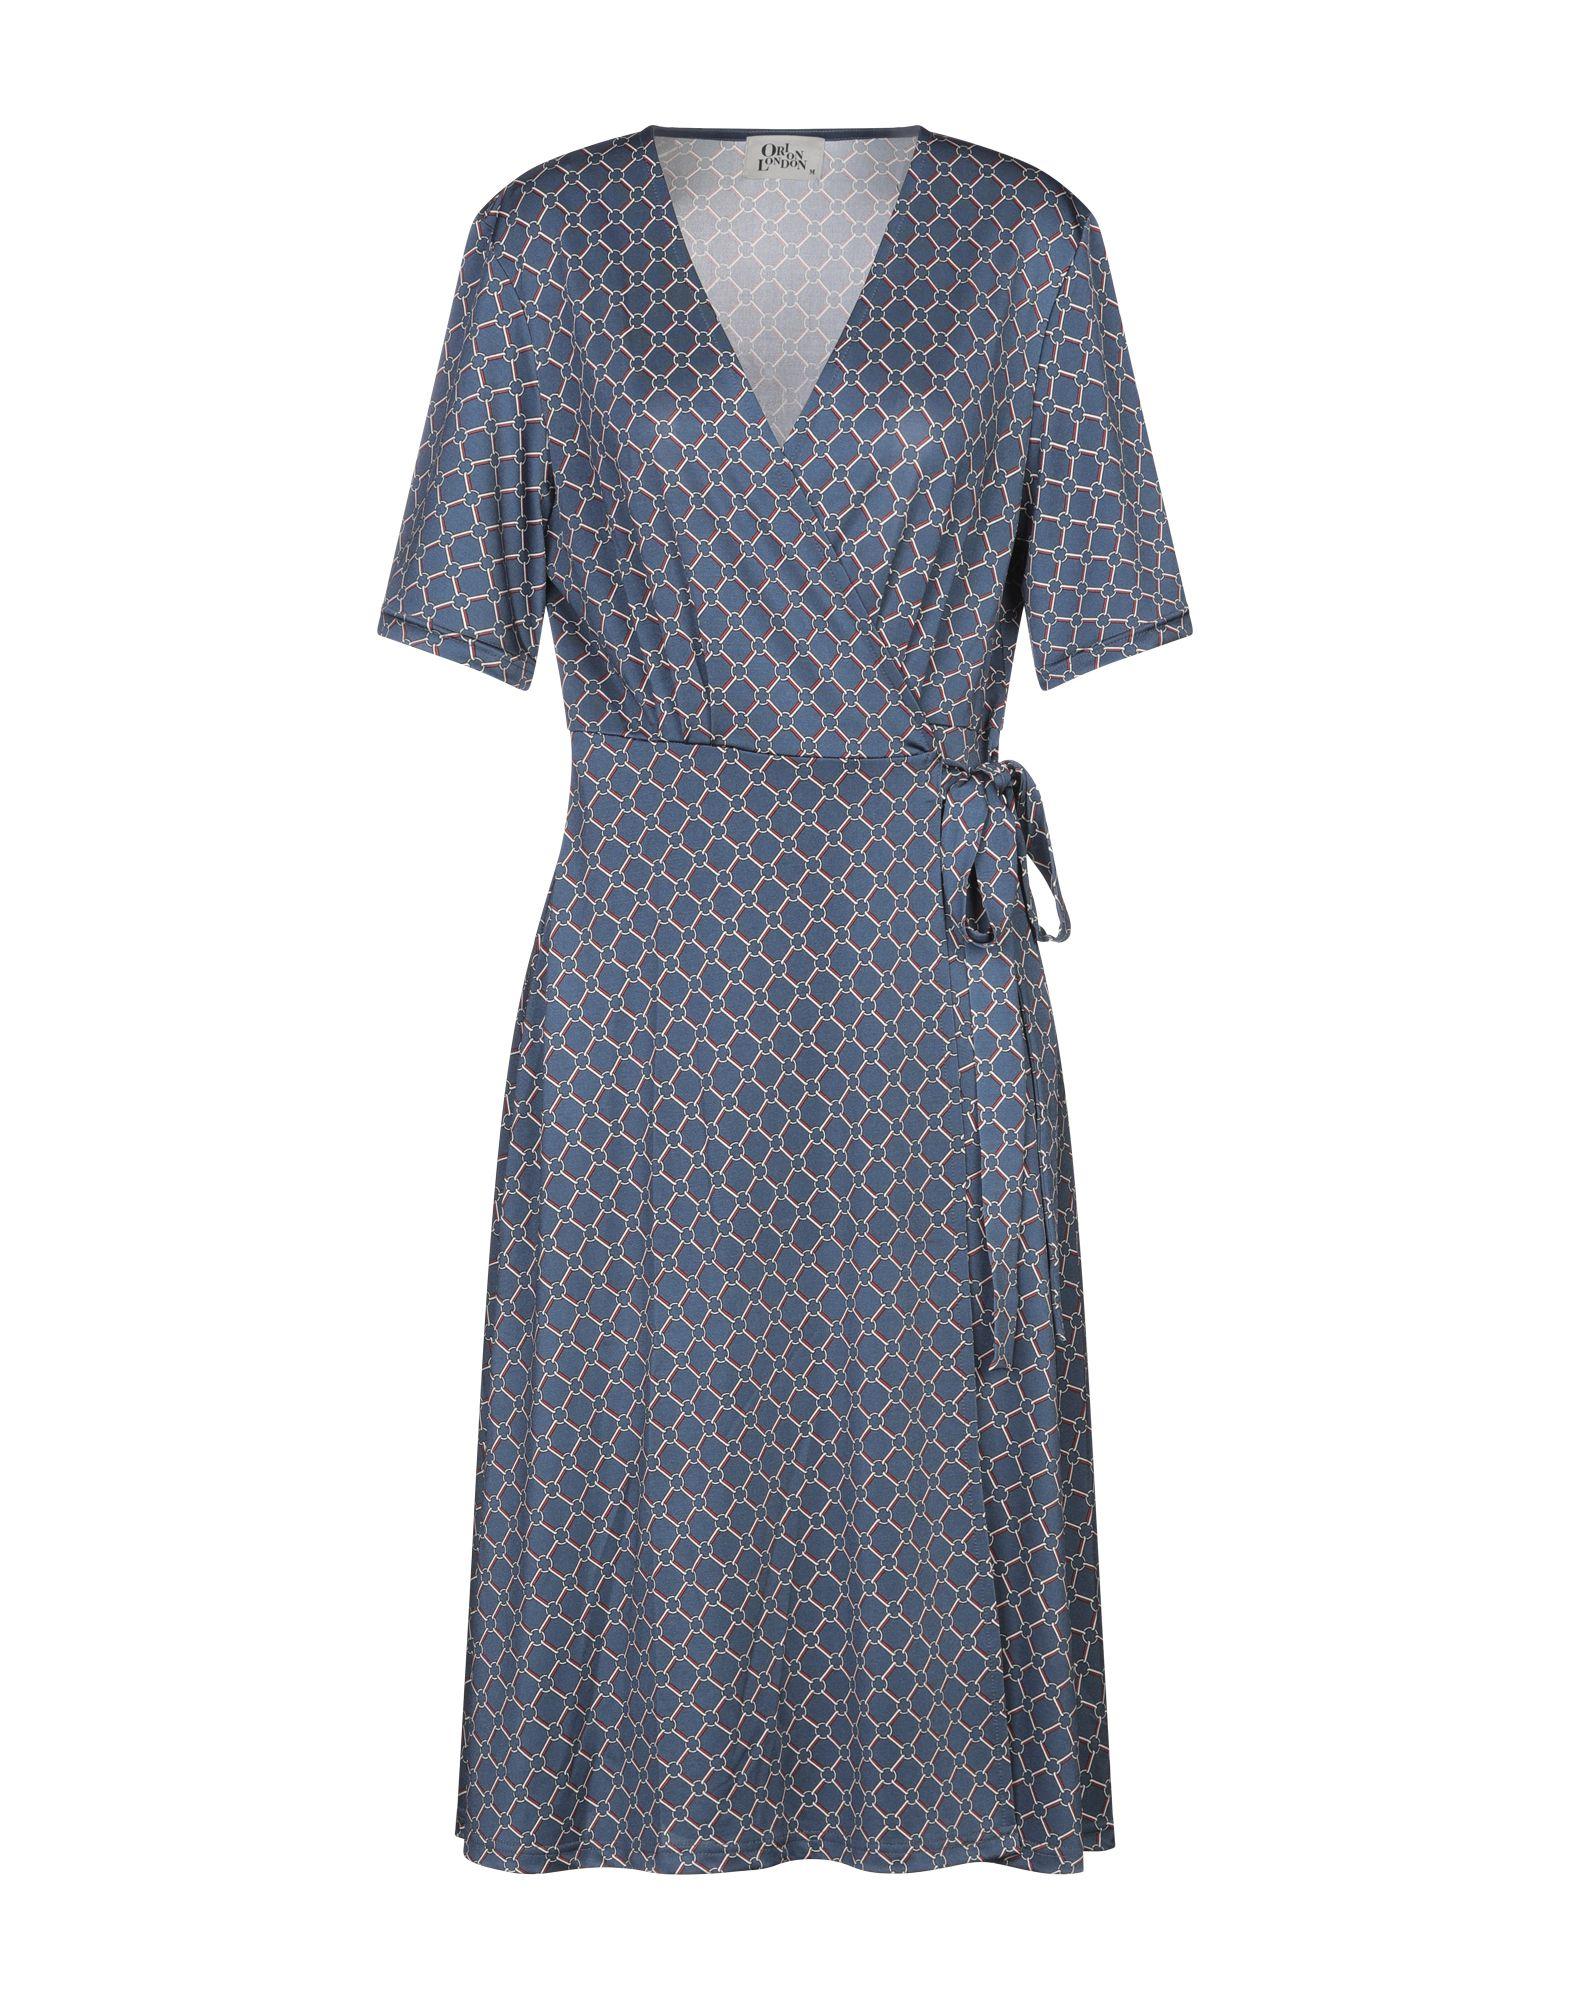 ORION LONDON Платье до колена